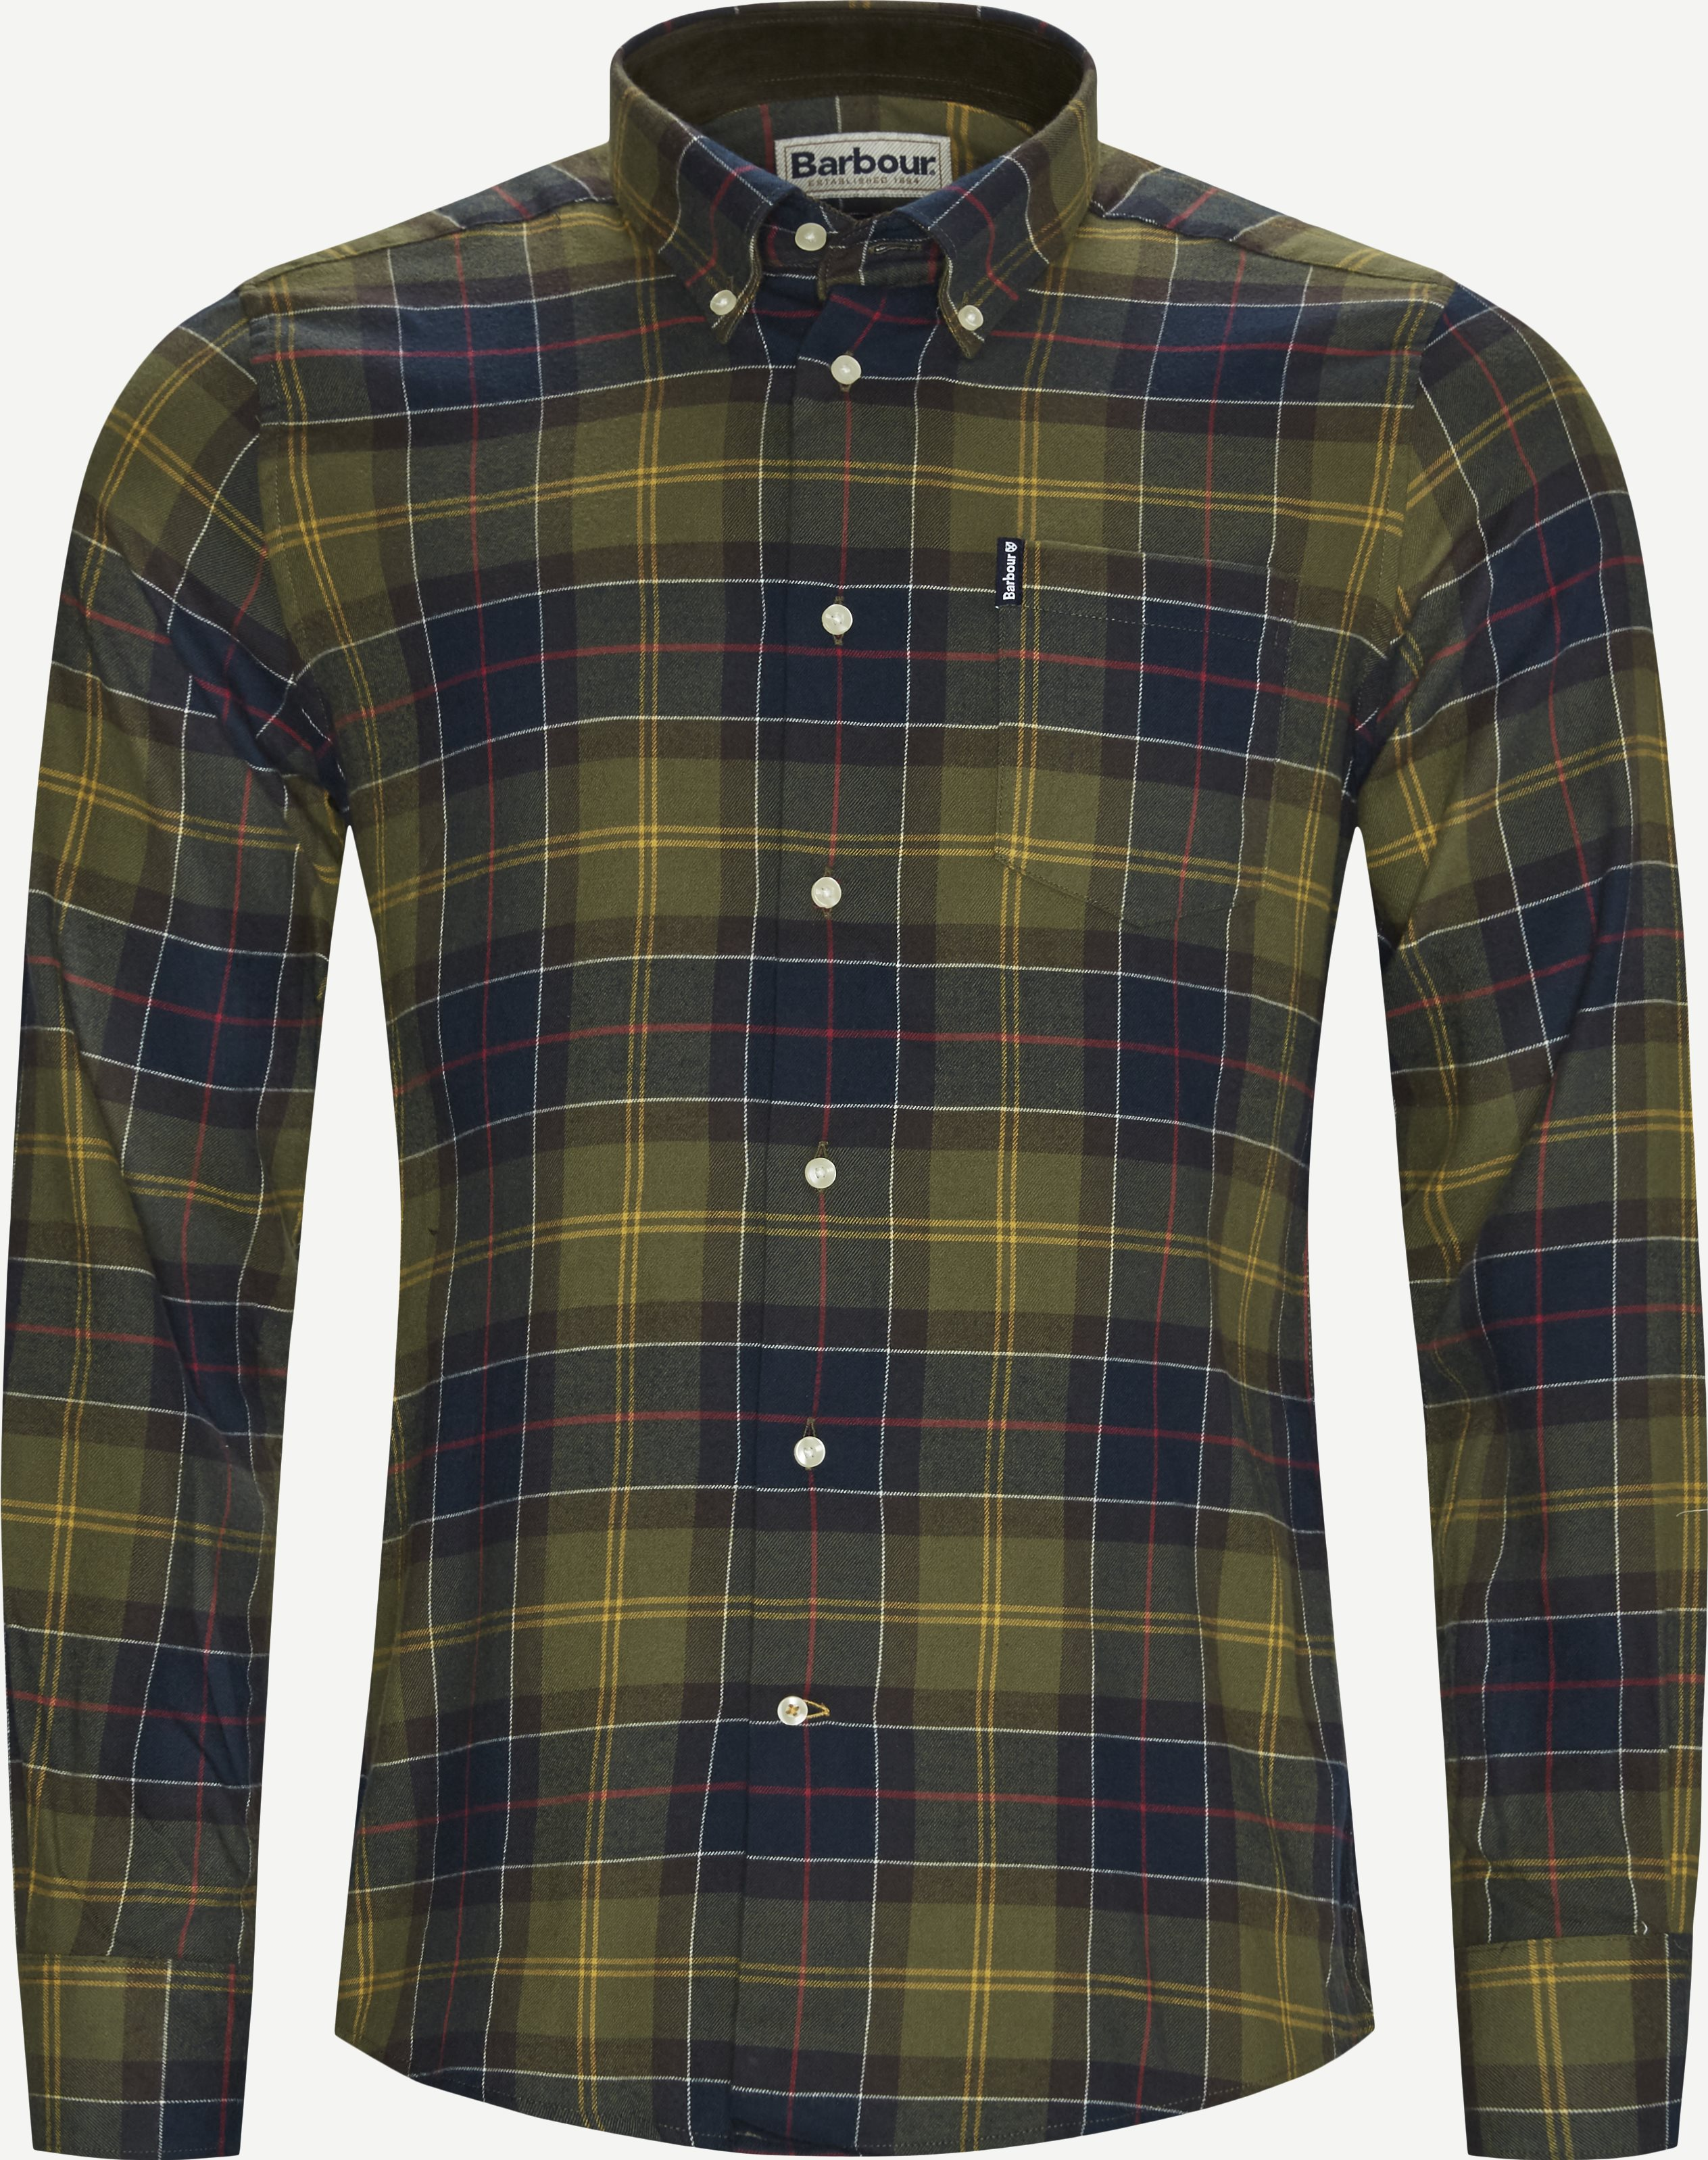 Hemden - Tailored fit - Oliv